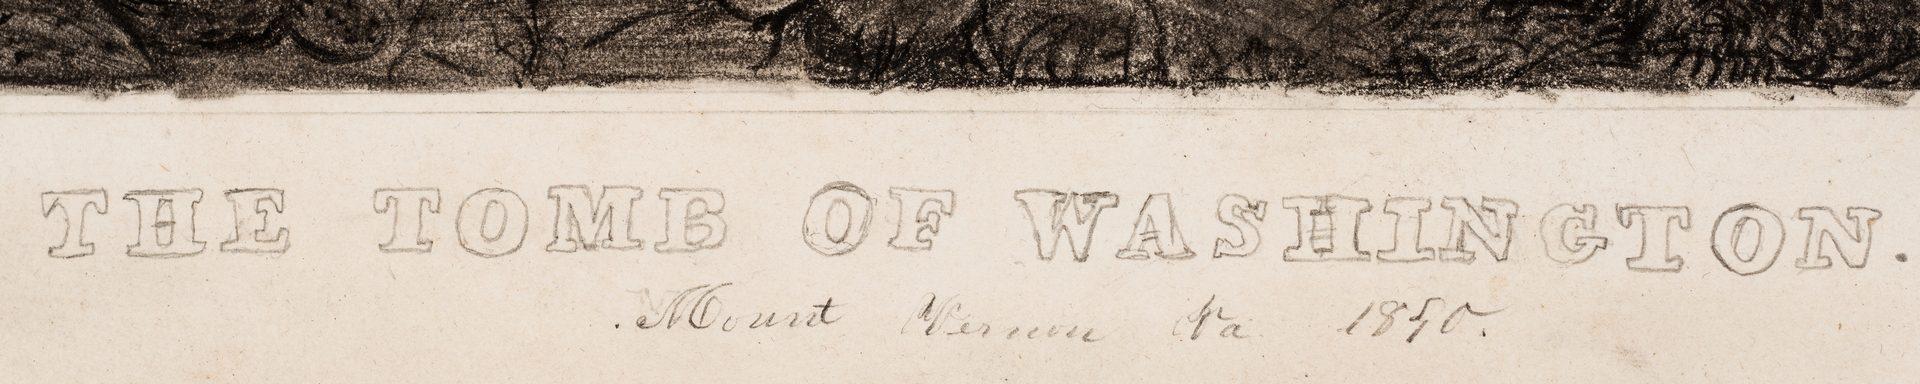 Lot 246: George Washington Tomb Drawing, 1850